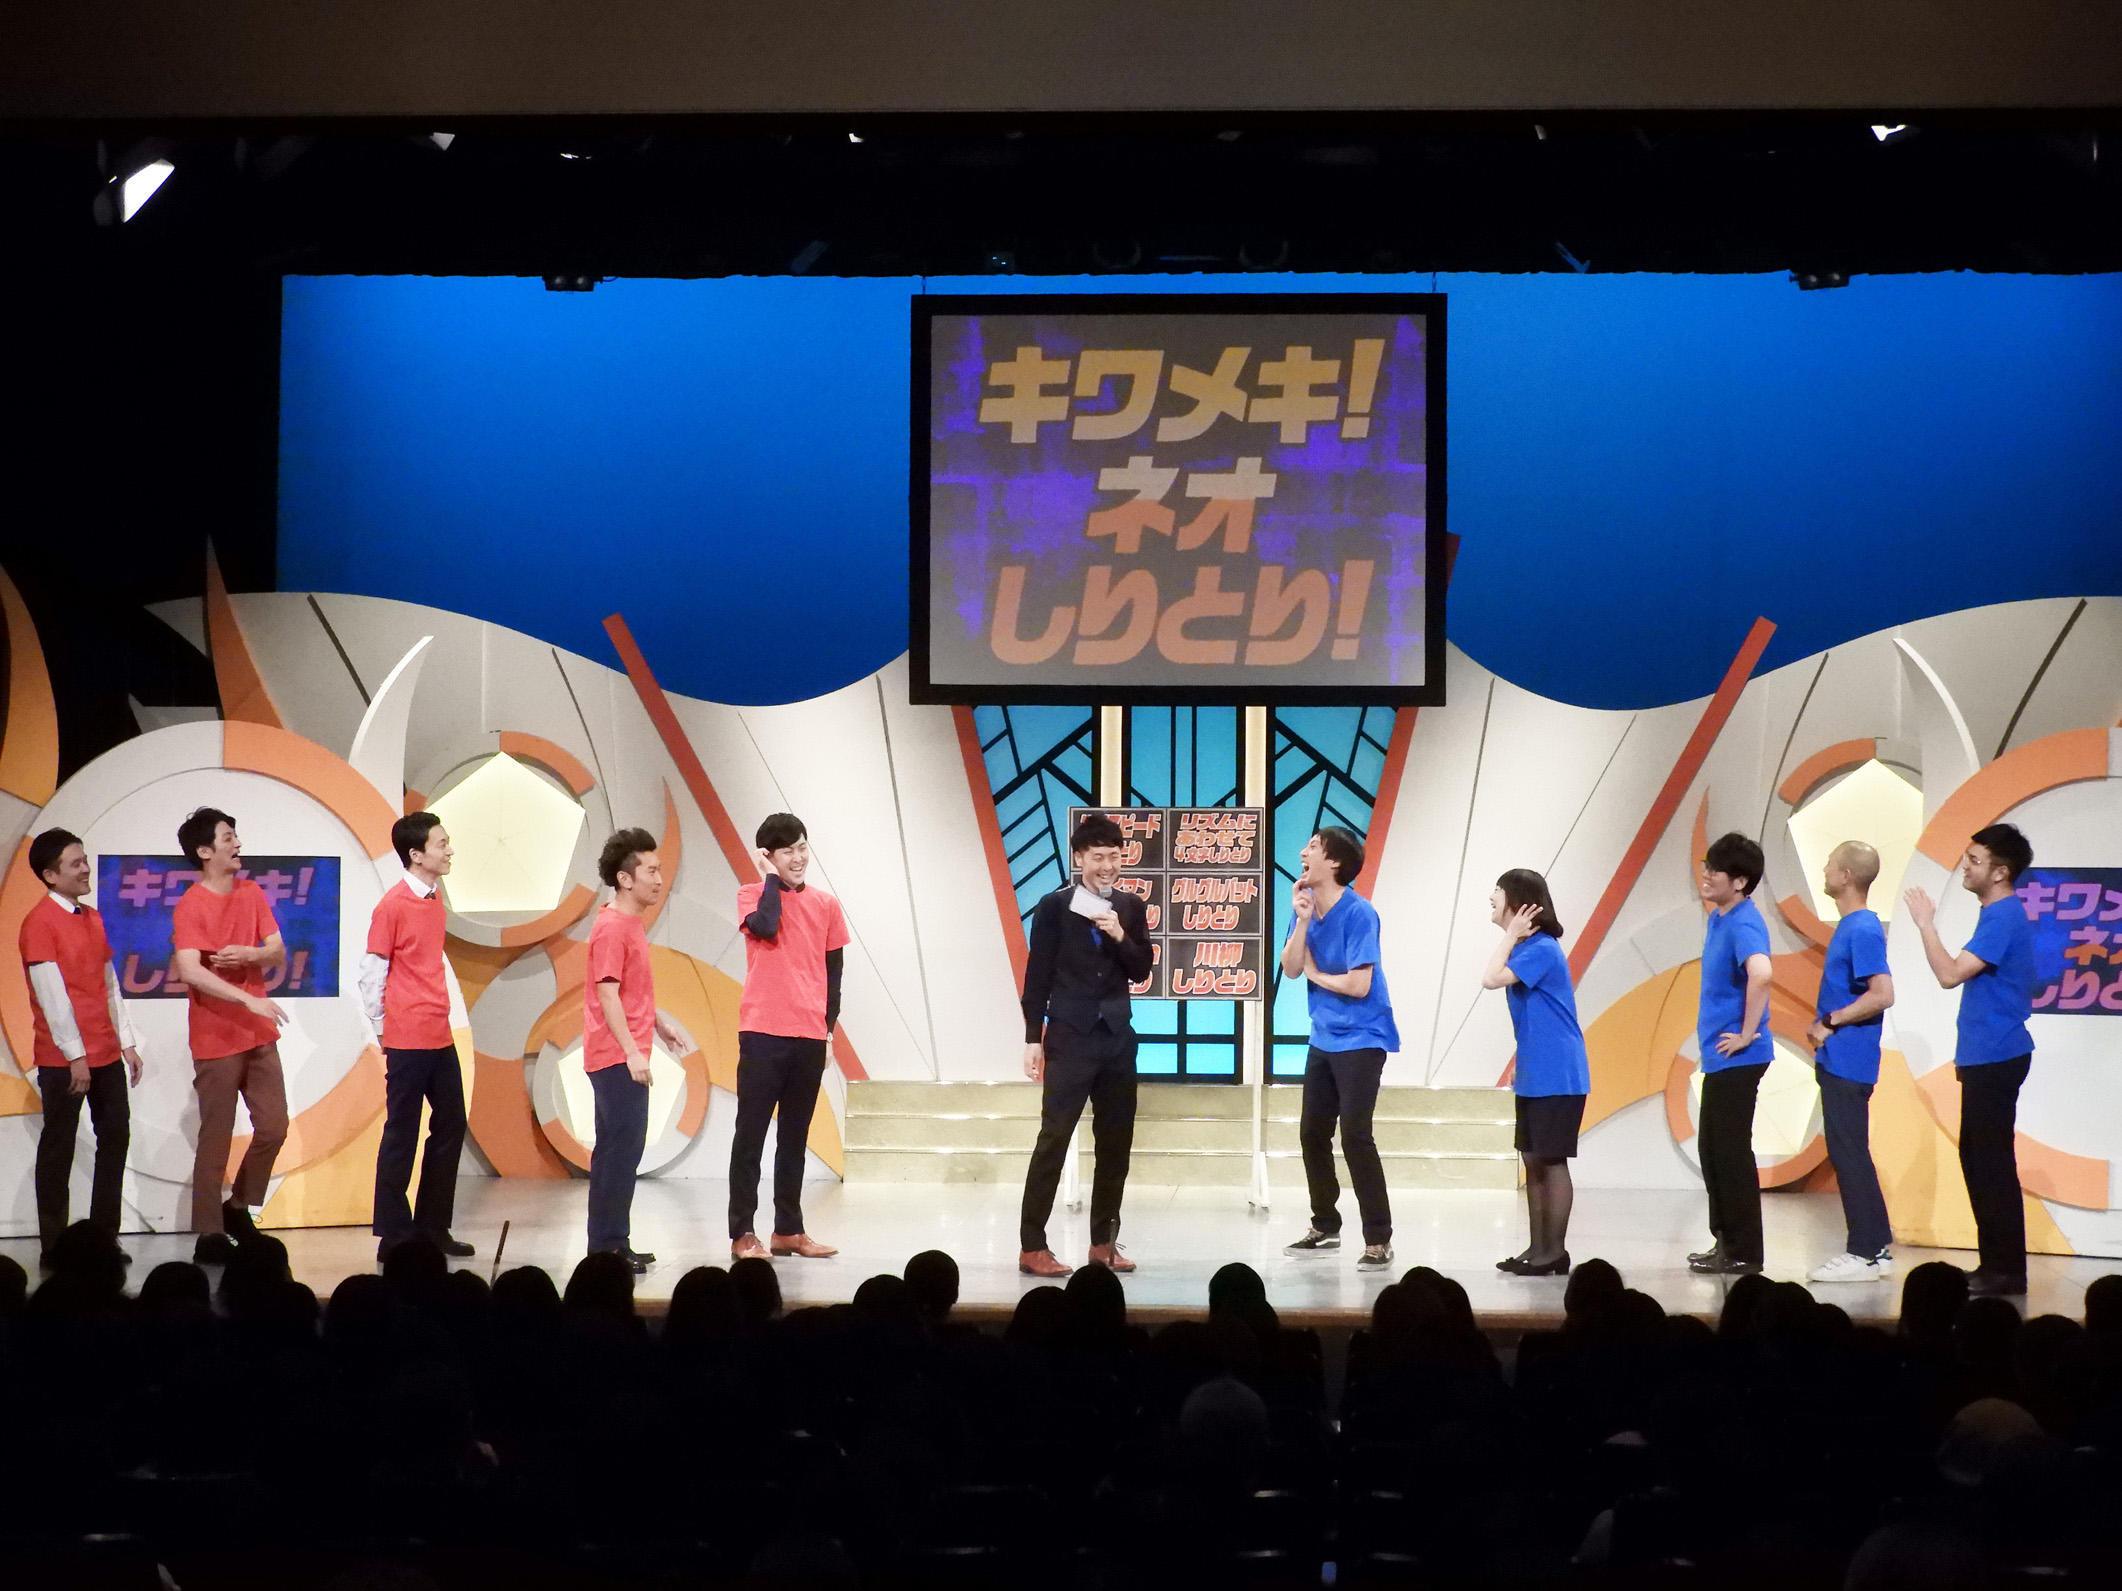 http://news.yoshimoto.co.jp/20181105123843-94f99fa2bca3caaedc3247e3327238d96d6c3466.jpg